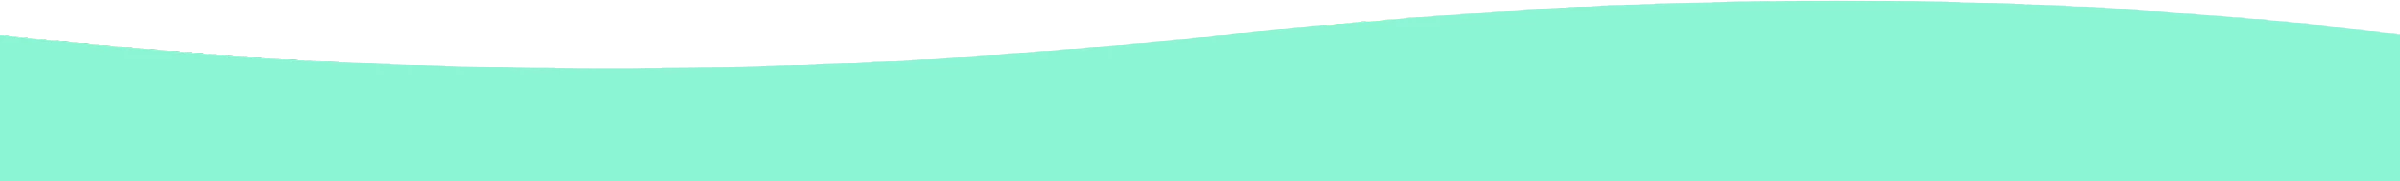 teal-curved-bg